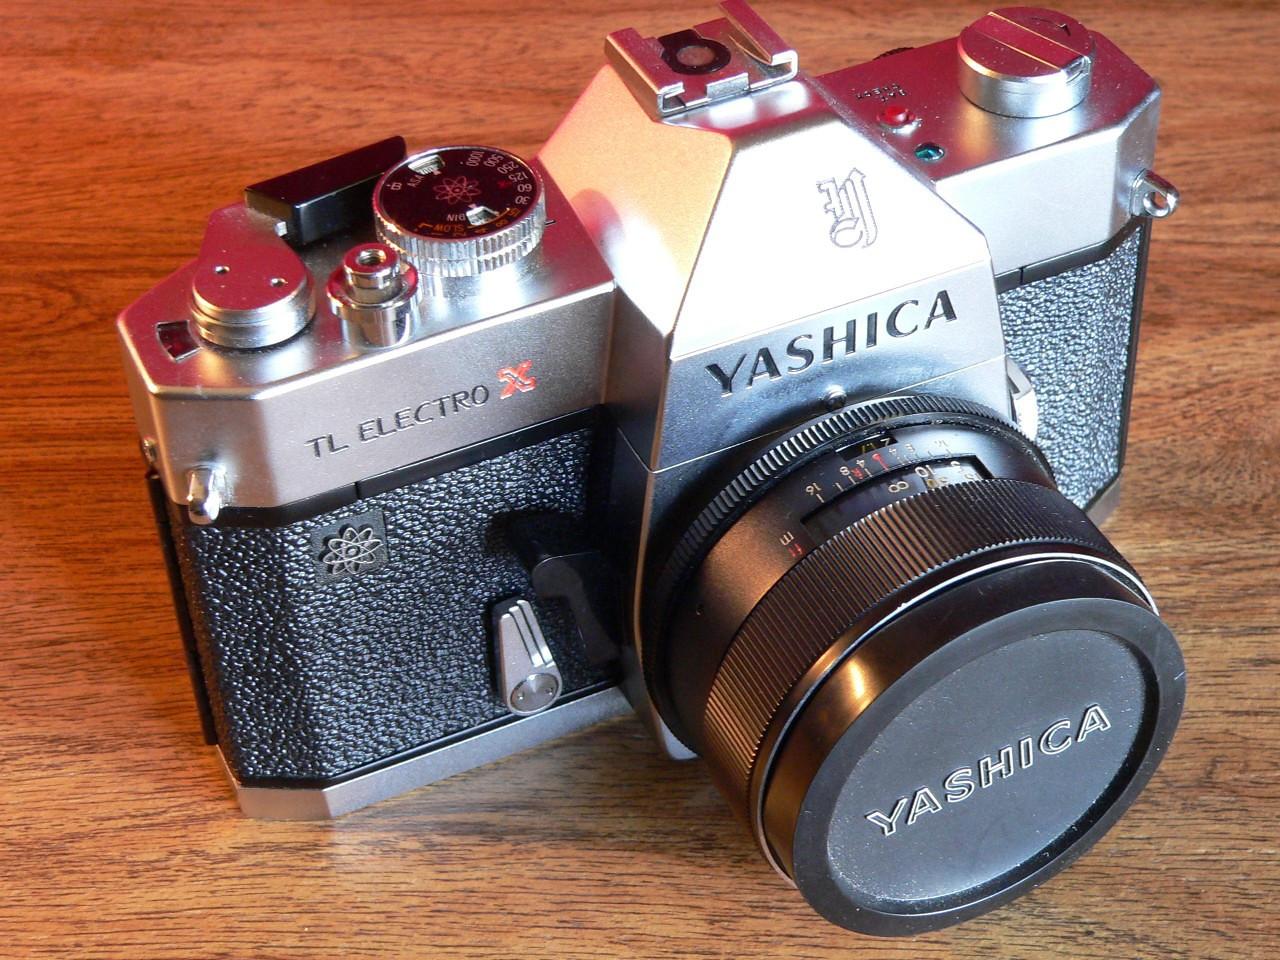 Yashica TL Electro-X Silver  (1969-1974)